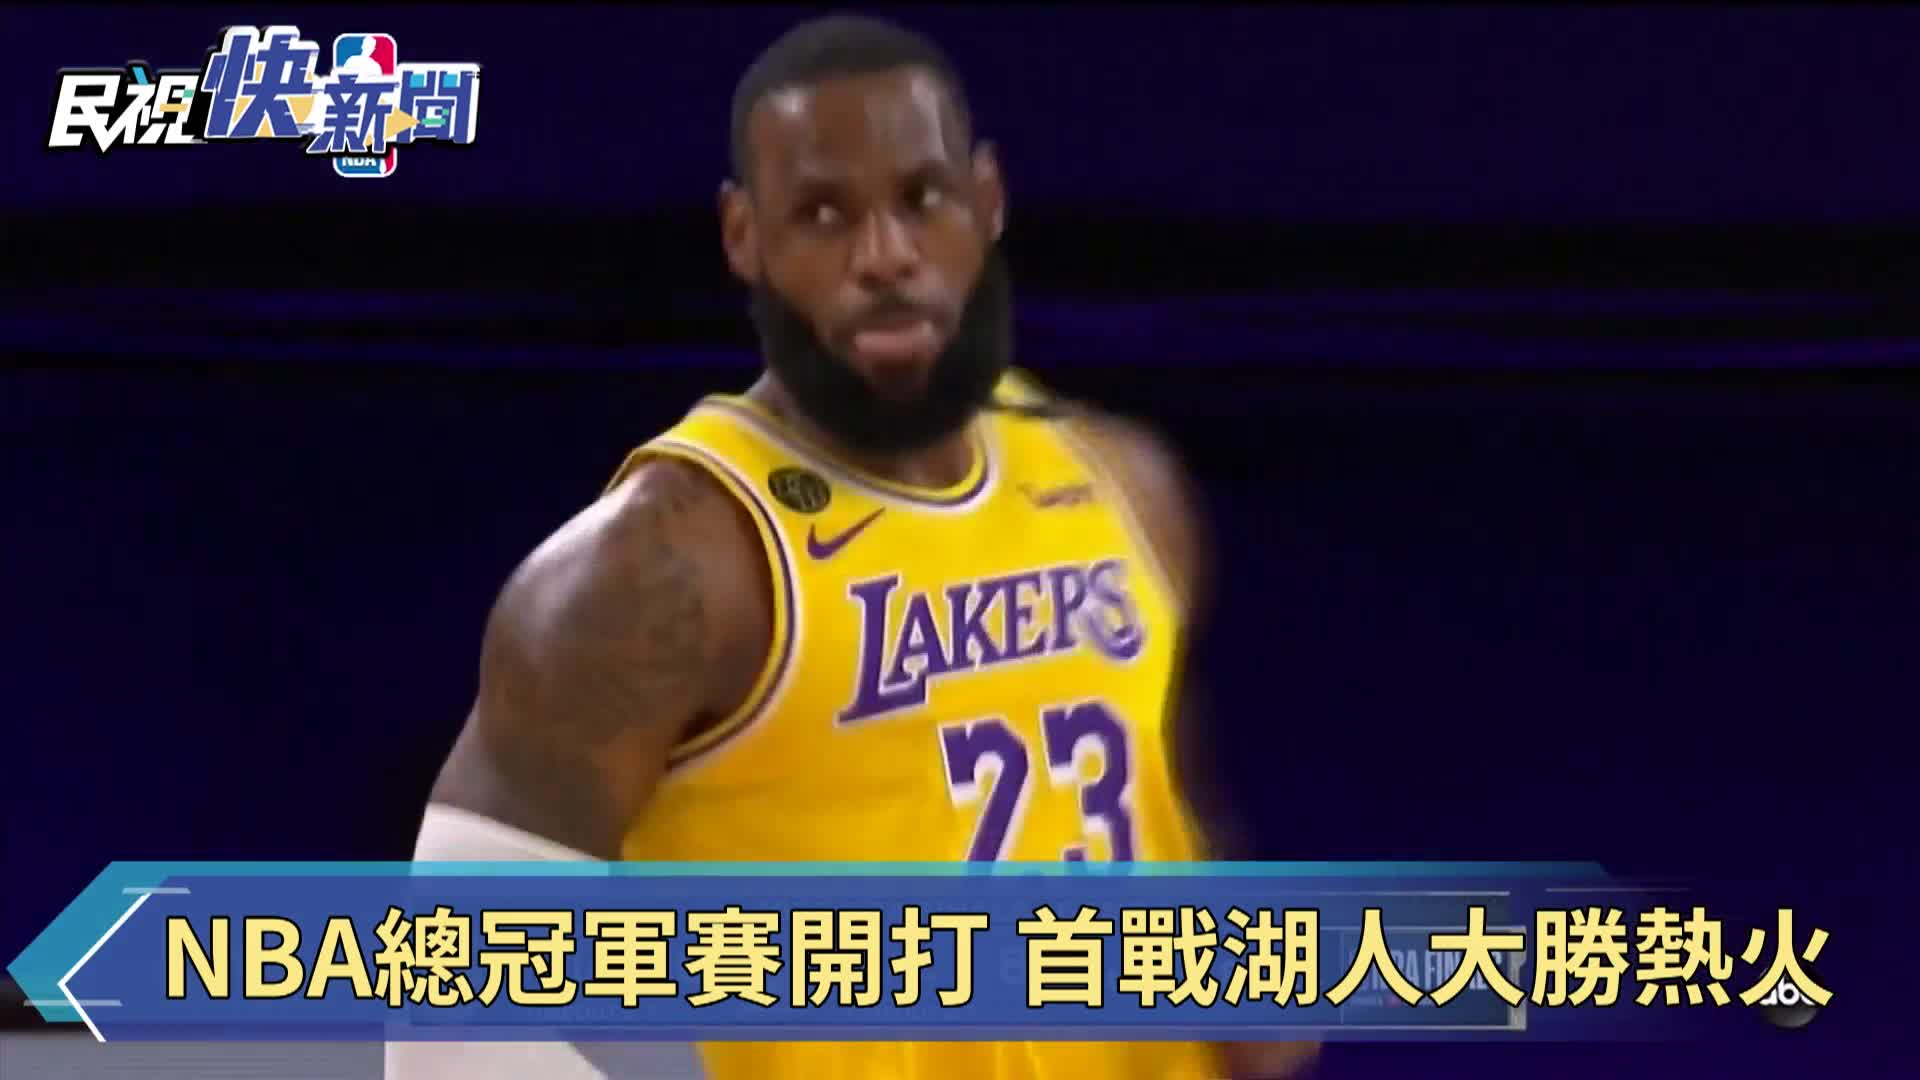 NBA總冠軍賽開打 首戰湖人大勝熱火